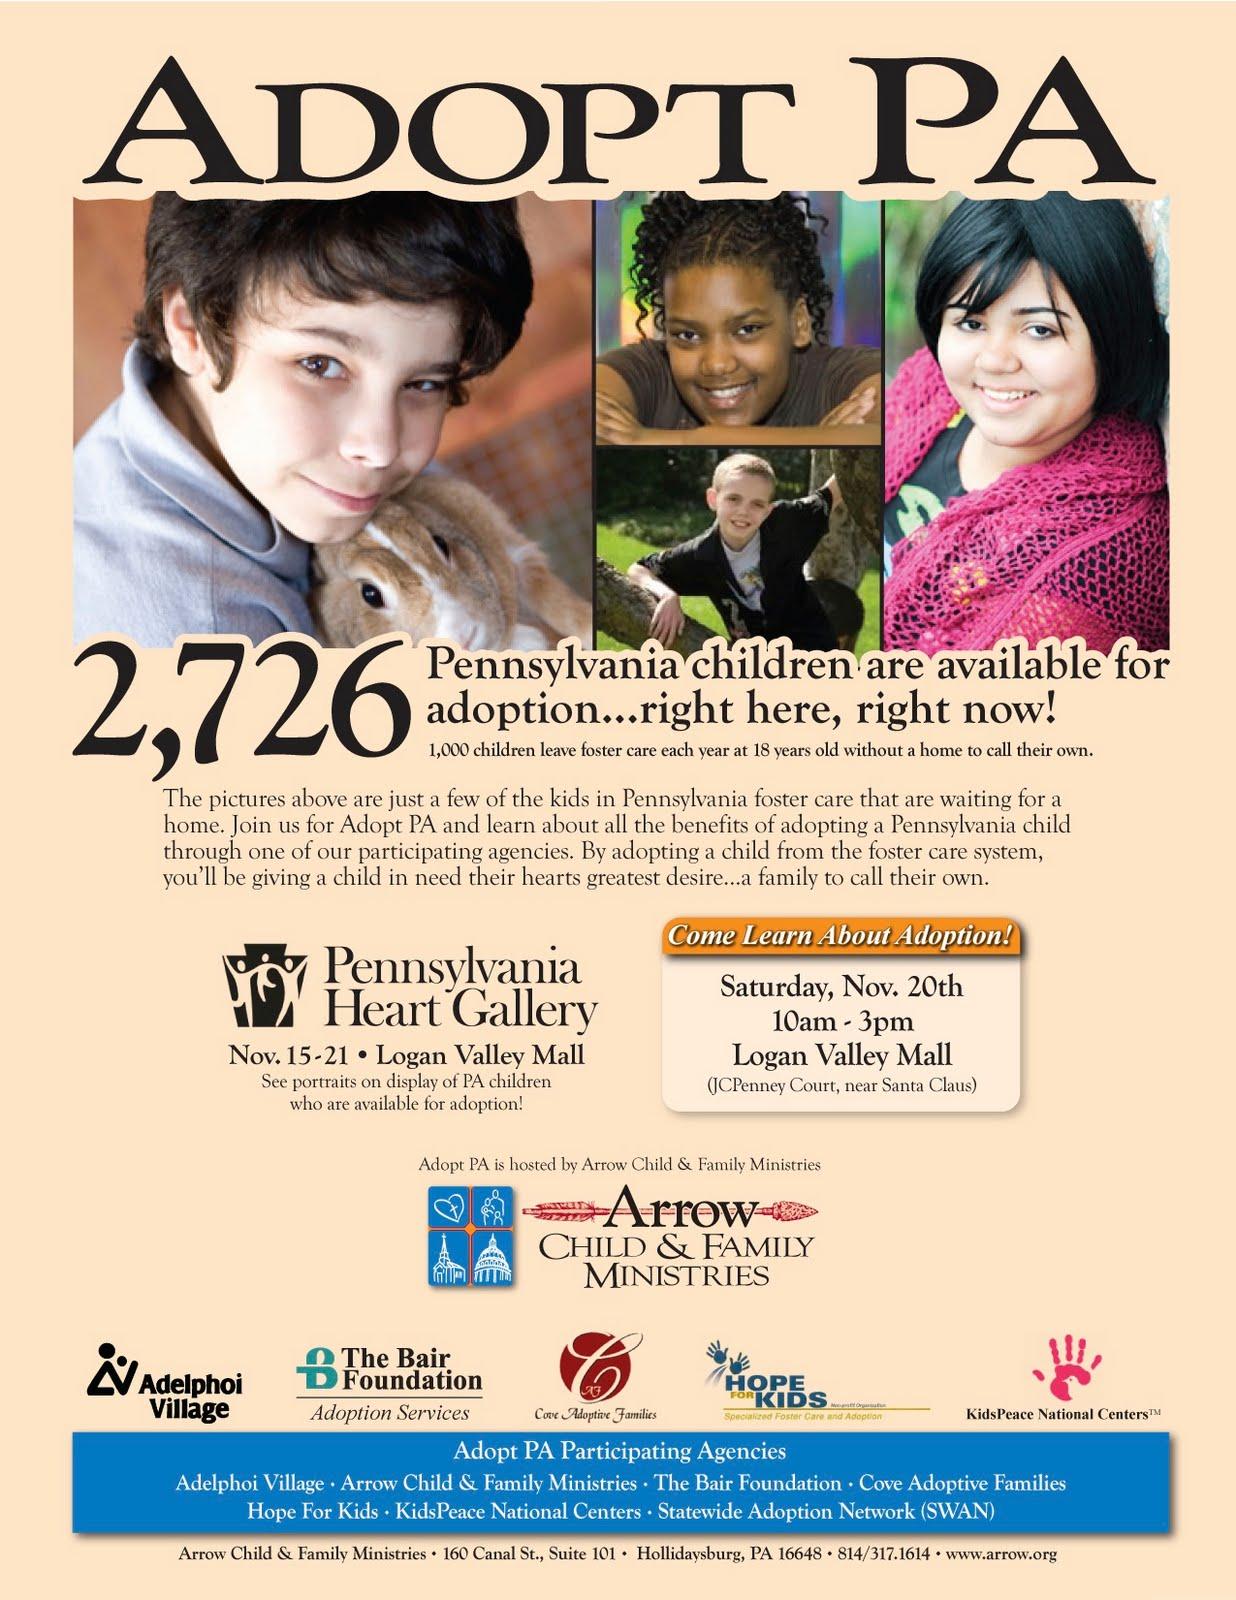 Celebrate National Adoption Month Cove Adoptive Families Inc How To Adopt A  Child